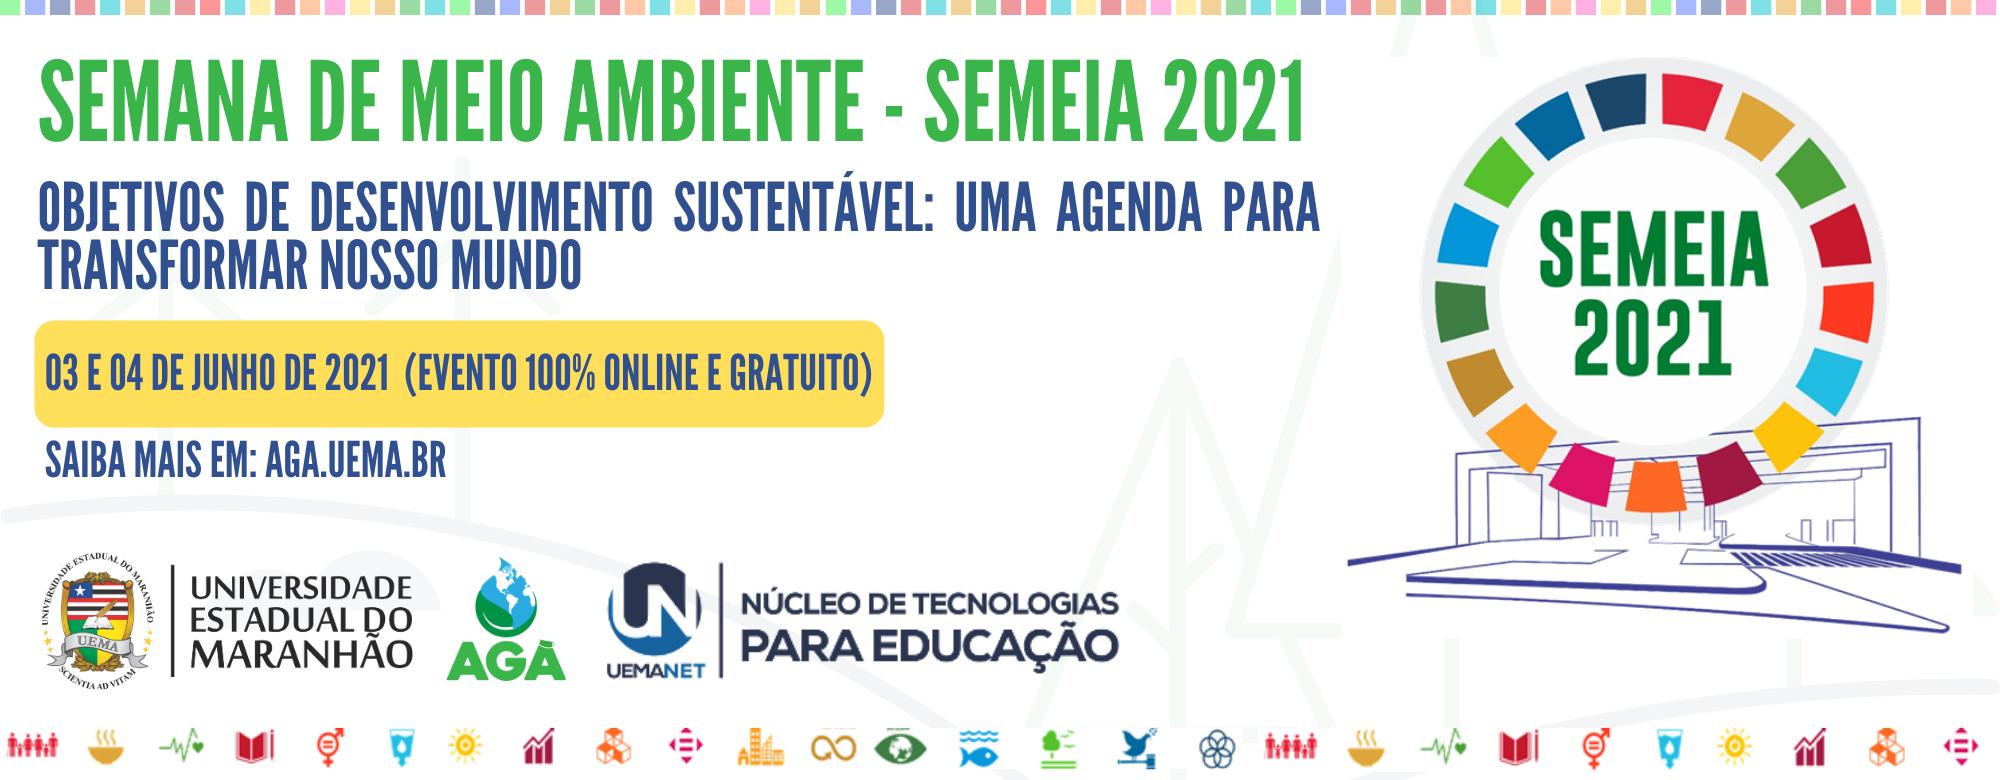 SEMEIA 2021